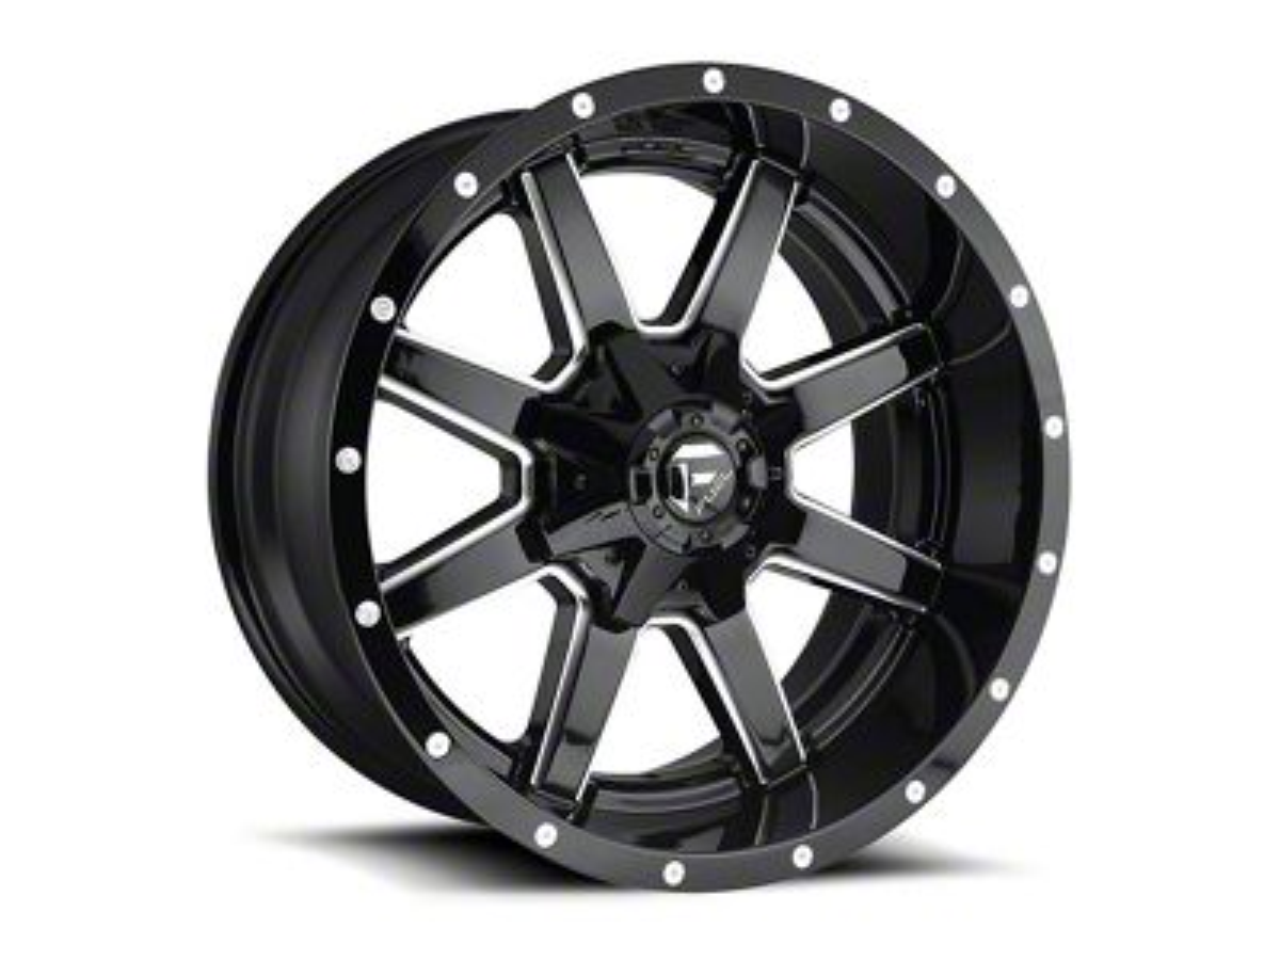 Fuel Wheels Maverick Gloss Black Milled 6-Lug Wheel - 20x12 (04-18 F-150)